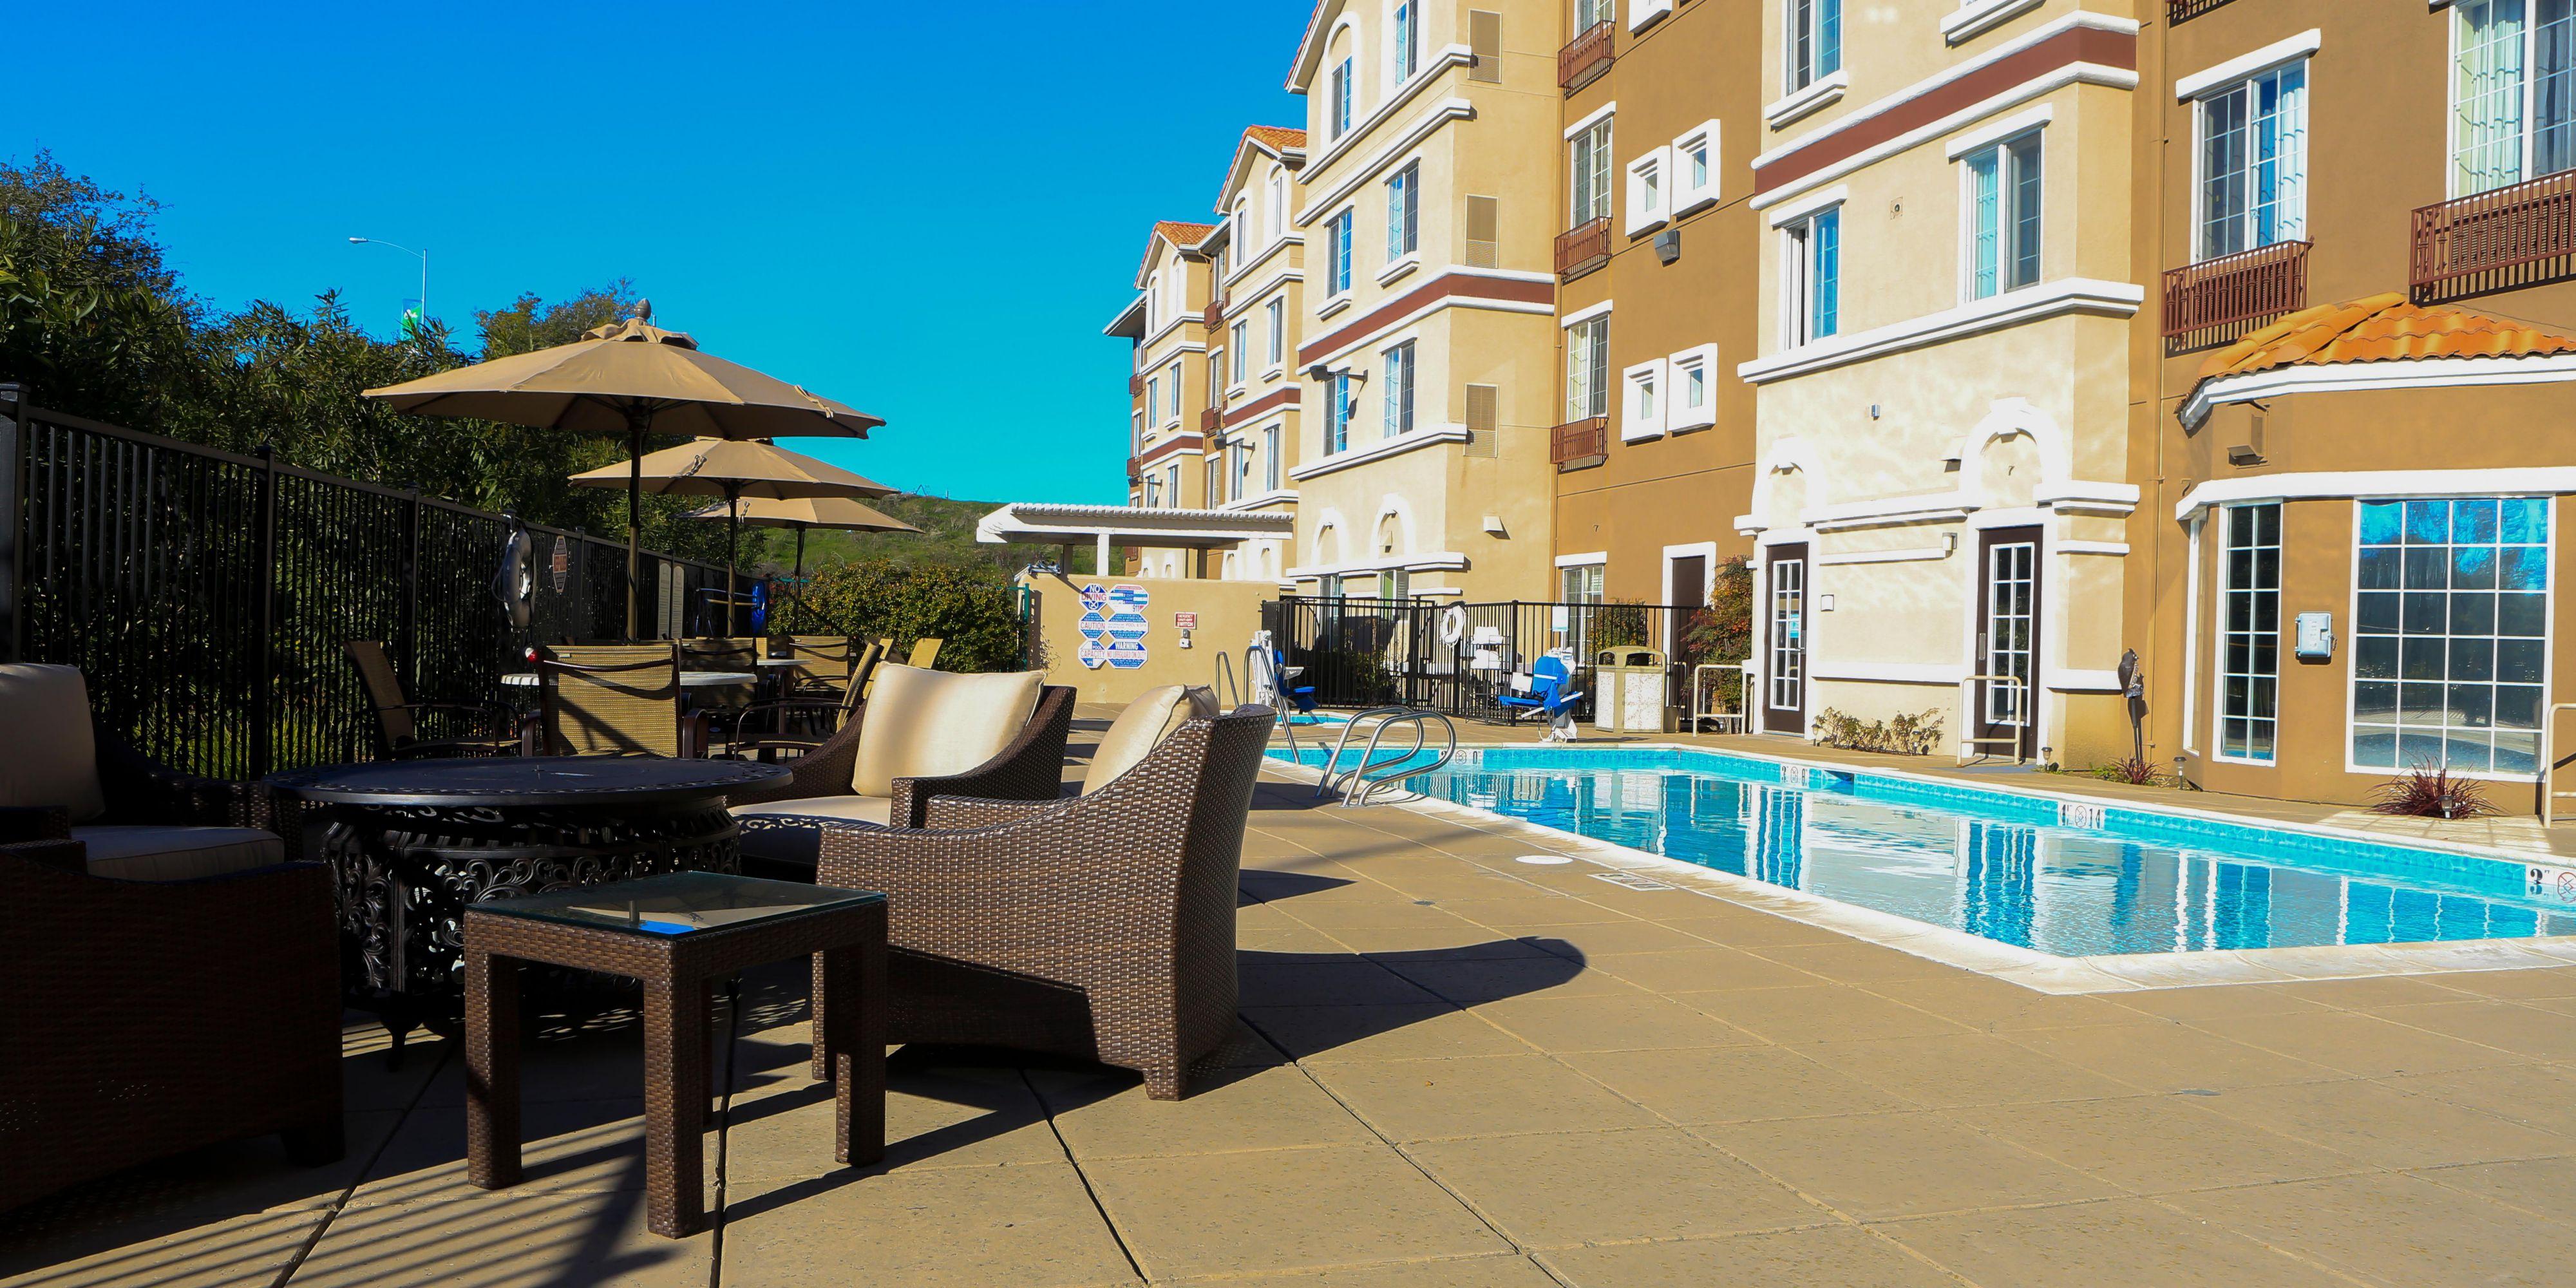 Staybridge Suites Silicon Valley-Milpitas image 2